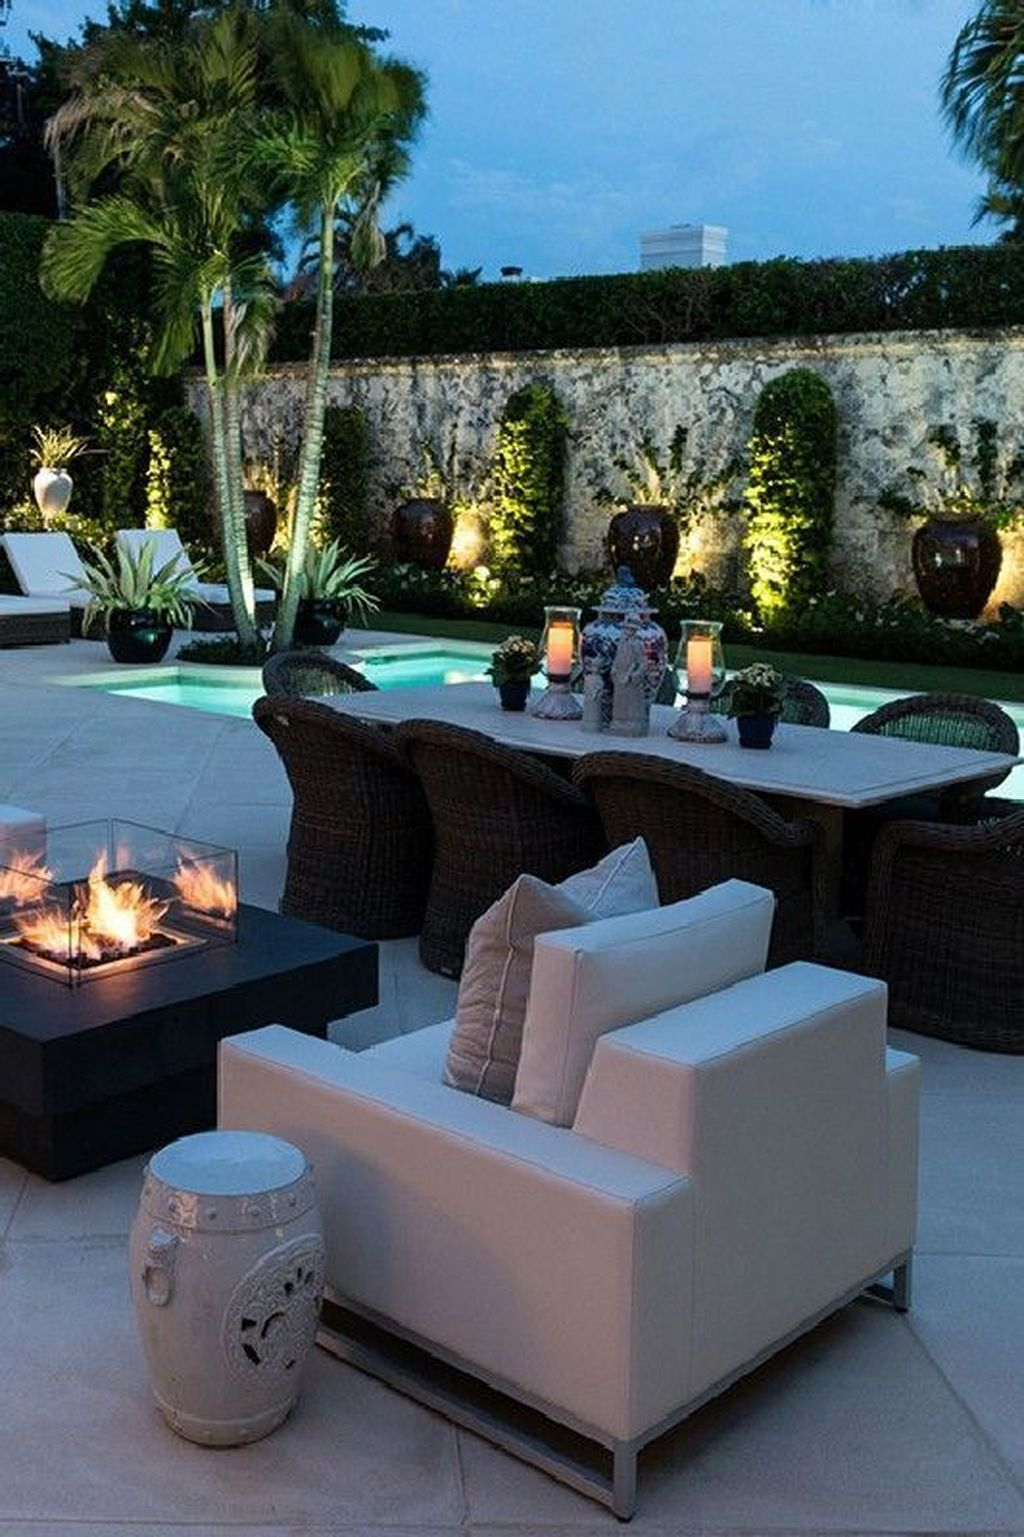 Awesome Backyard Patio Ideas With Beautiful Pool 22